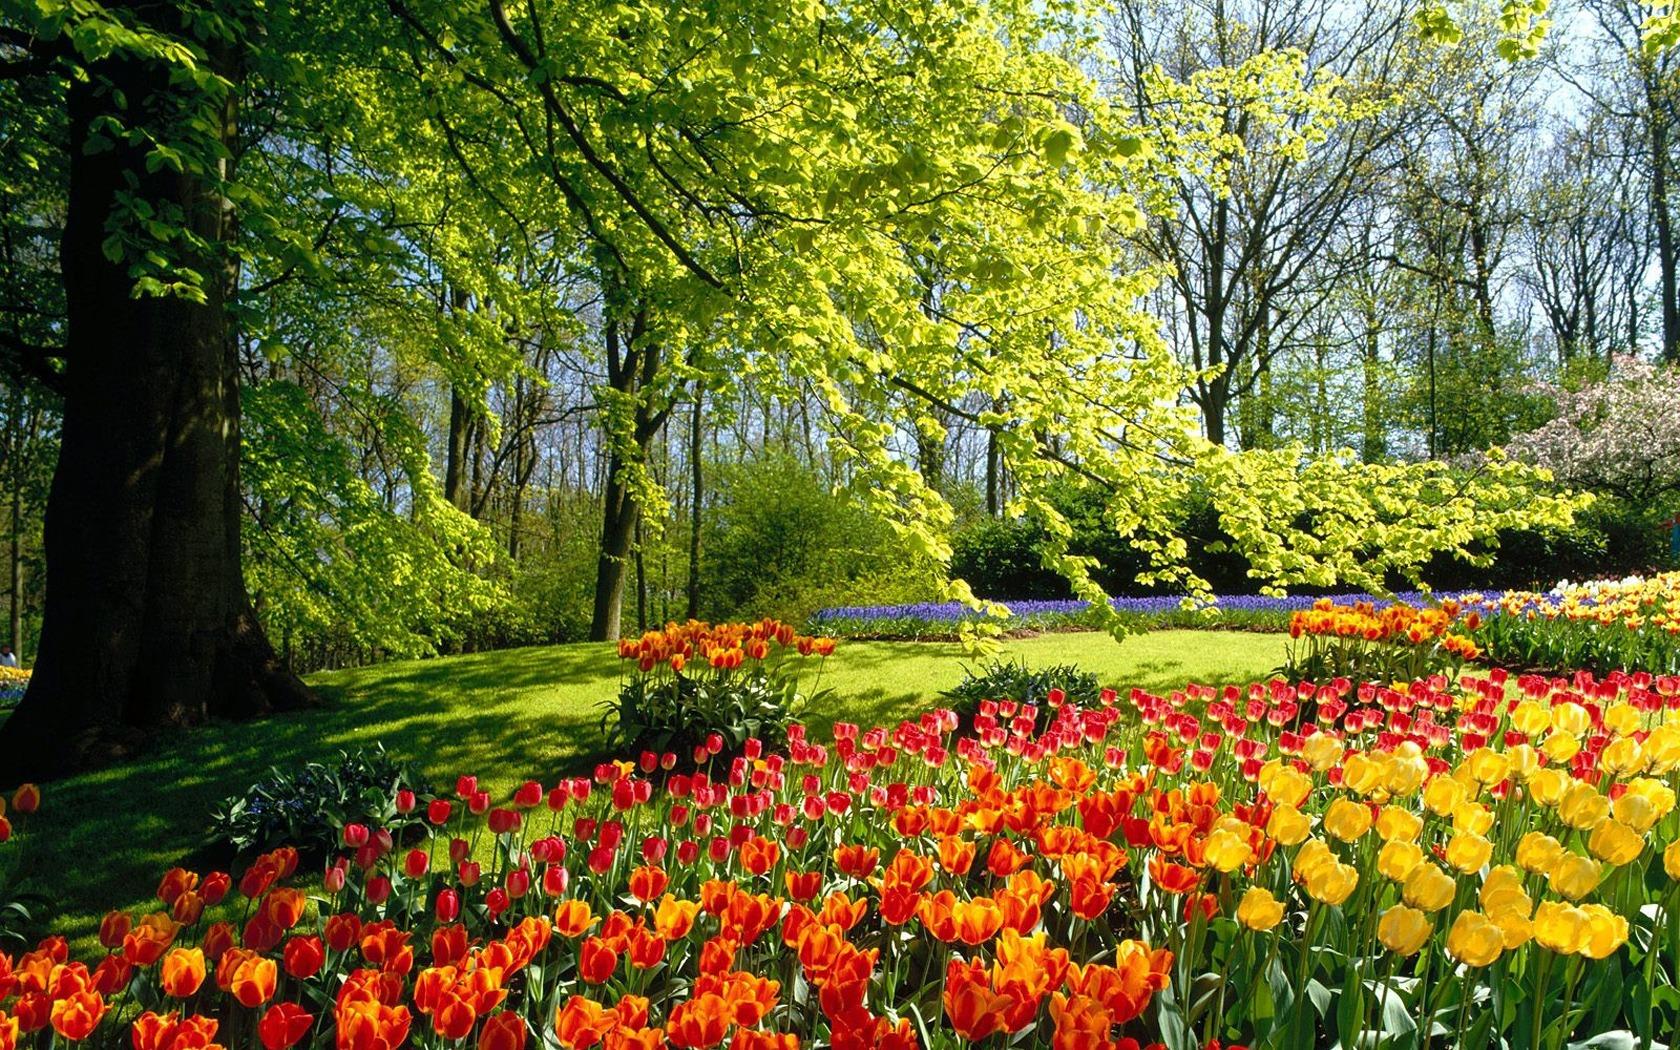 spring-park-1680-1050-3348